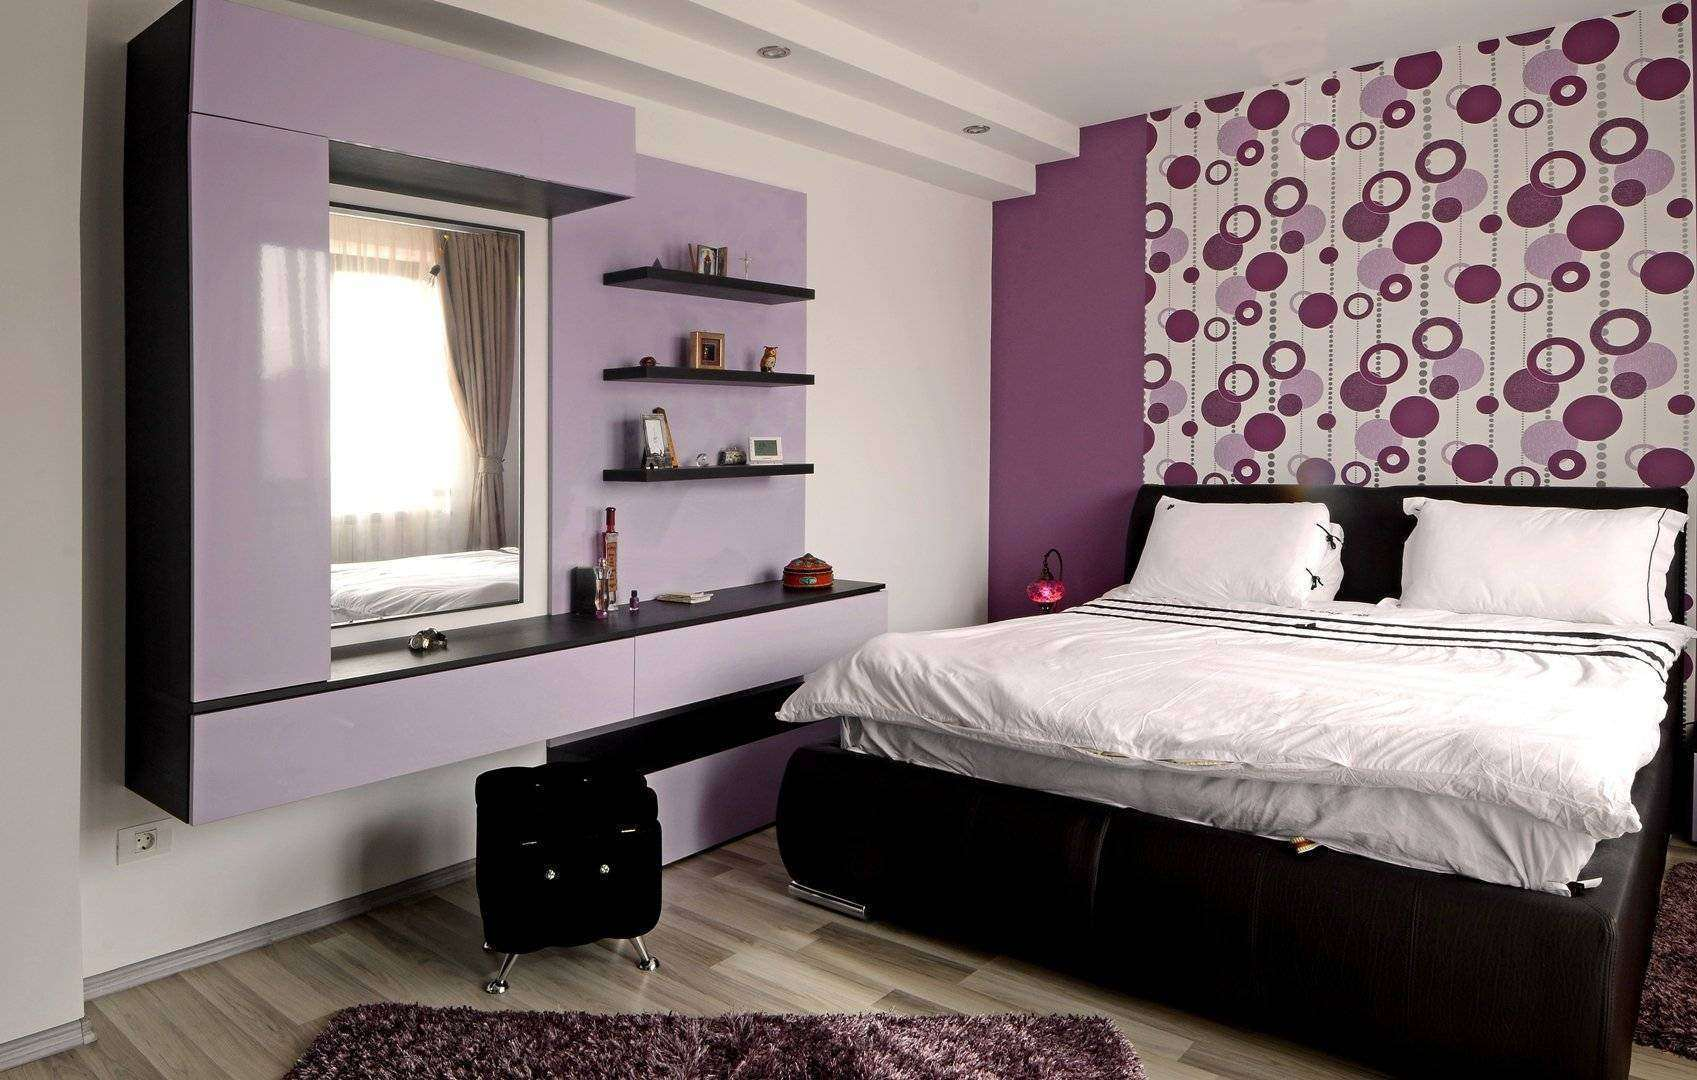 <a href=&quot;mobila dormitor la comanda moderna &quot;>dormitor matrimonial Ramona la comanda <img src='http://www.unican.ro/wp-content/themes/vita/img/dreapta.png' class='pull-right hidden-xs' style='margin-right:-10px;margin-top:-10px; max-height:41px'></a>